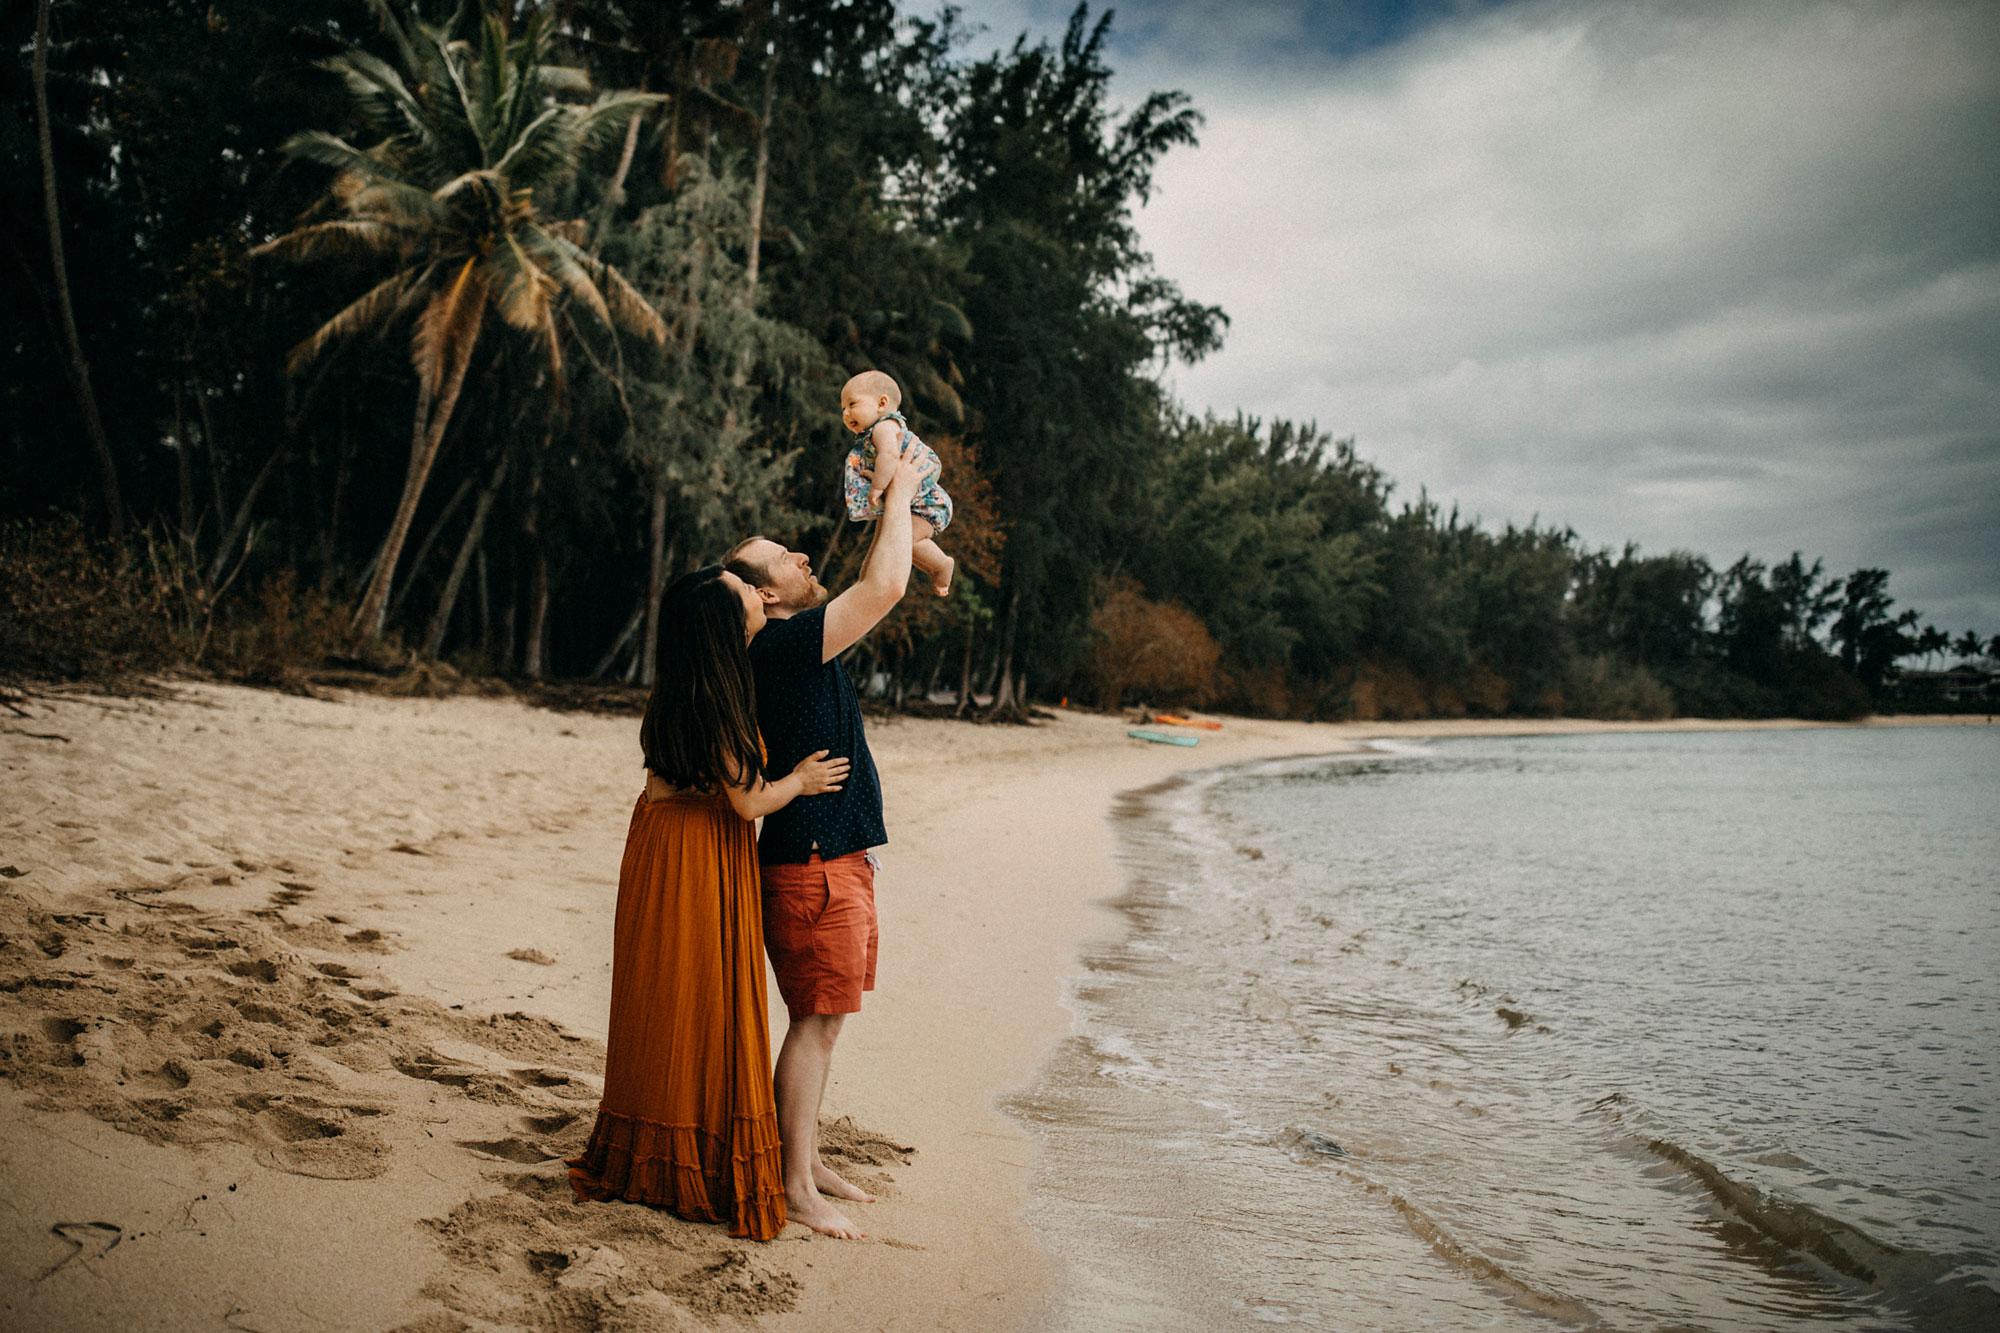 Family-Photographer-North-Shore-Oahu-Hawaii-13.jpg